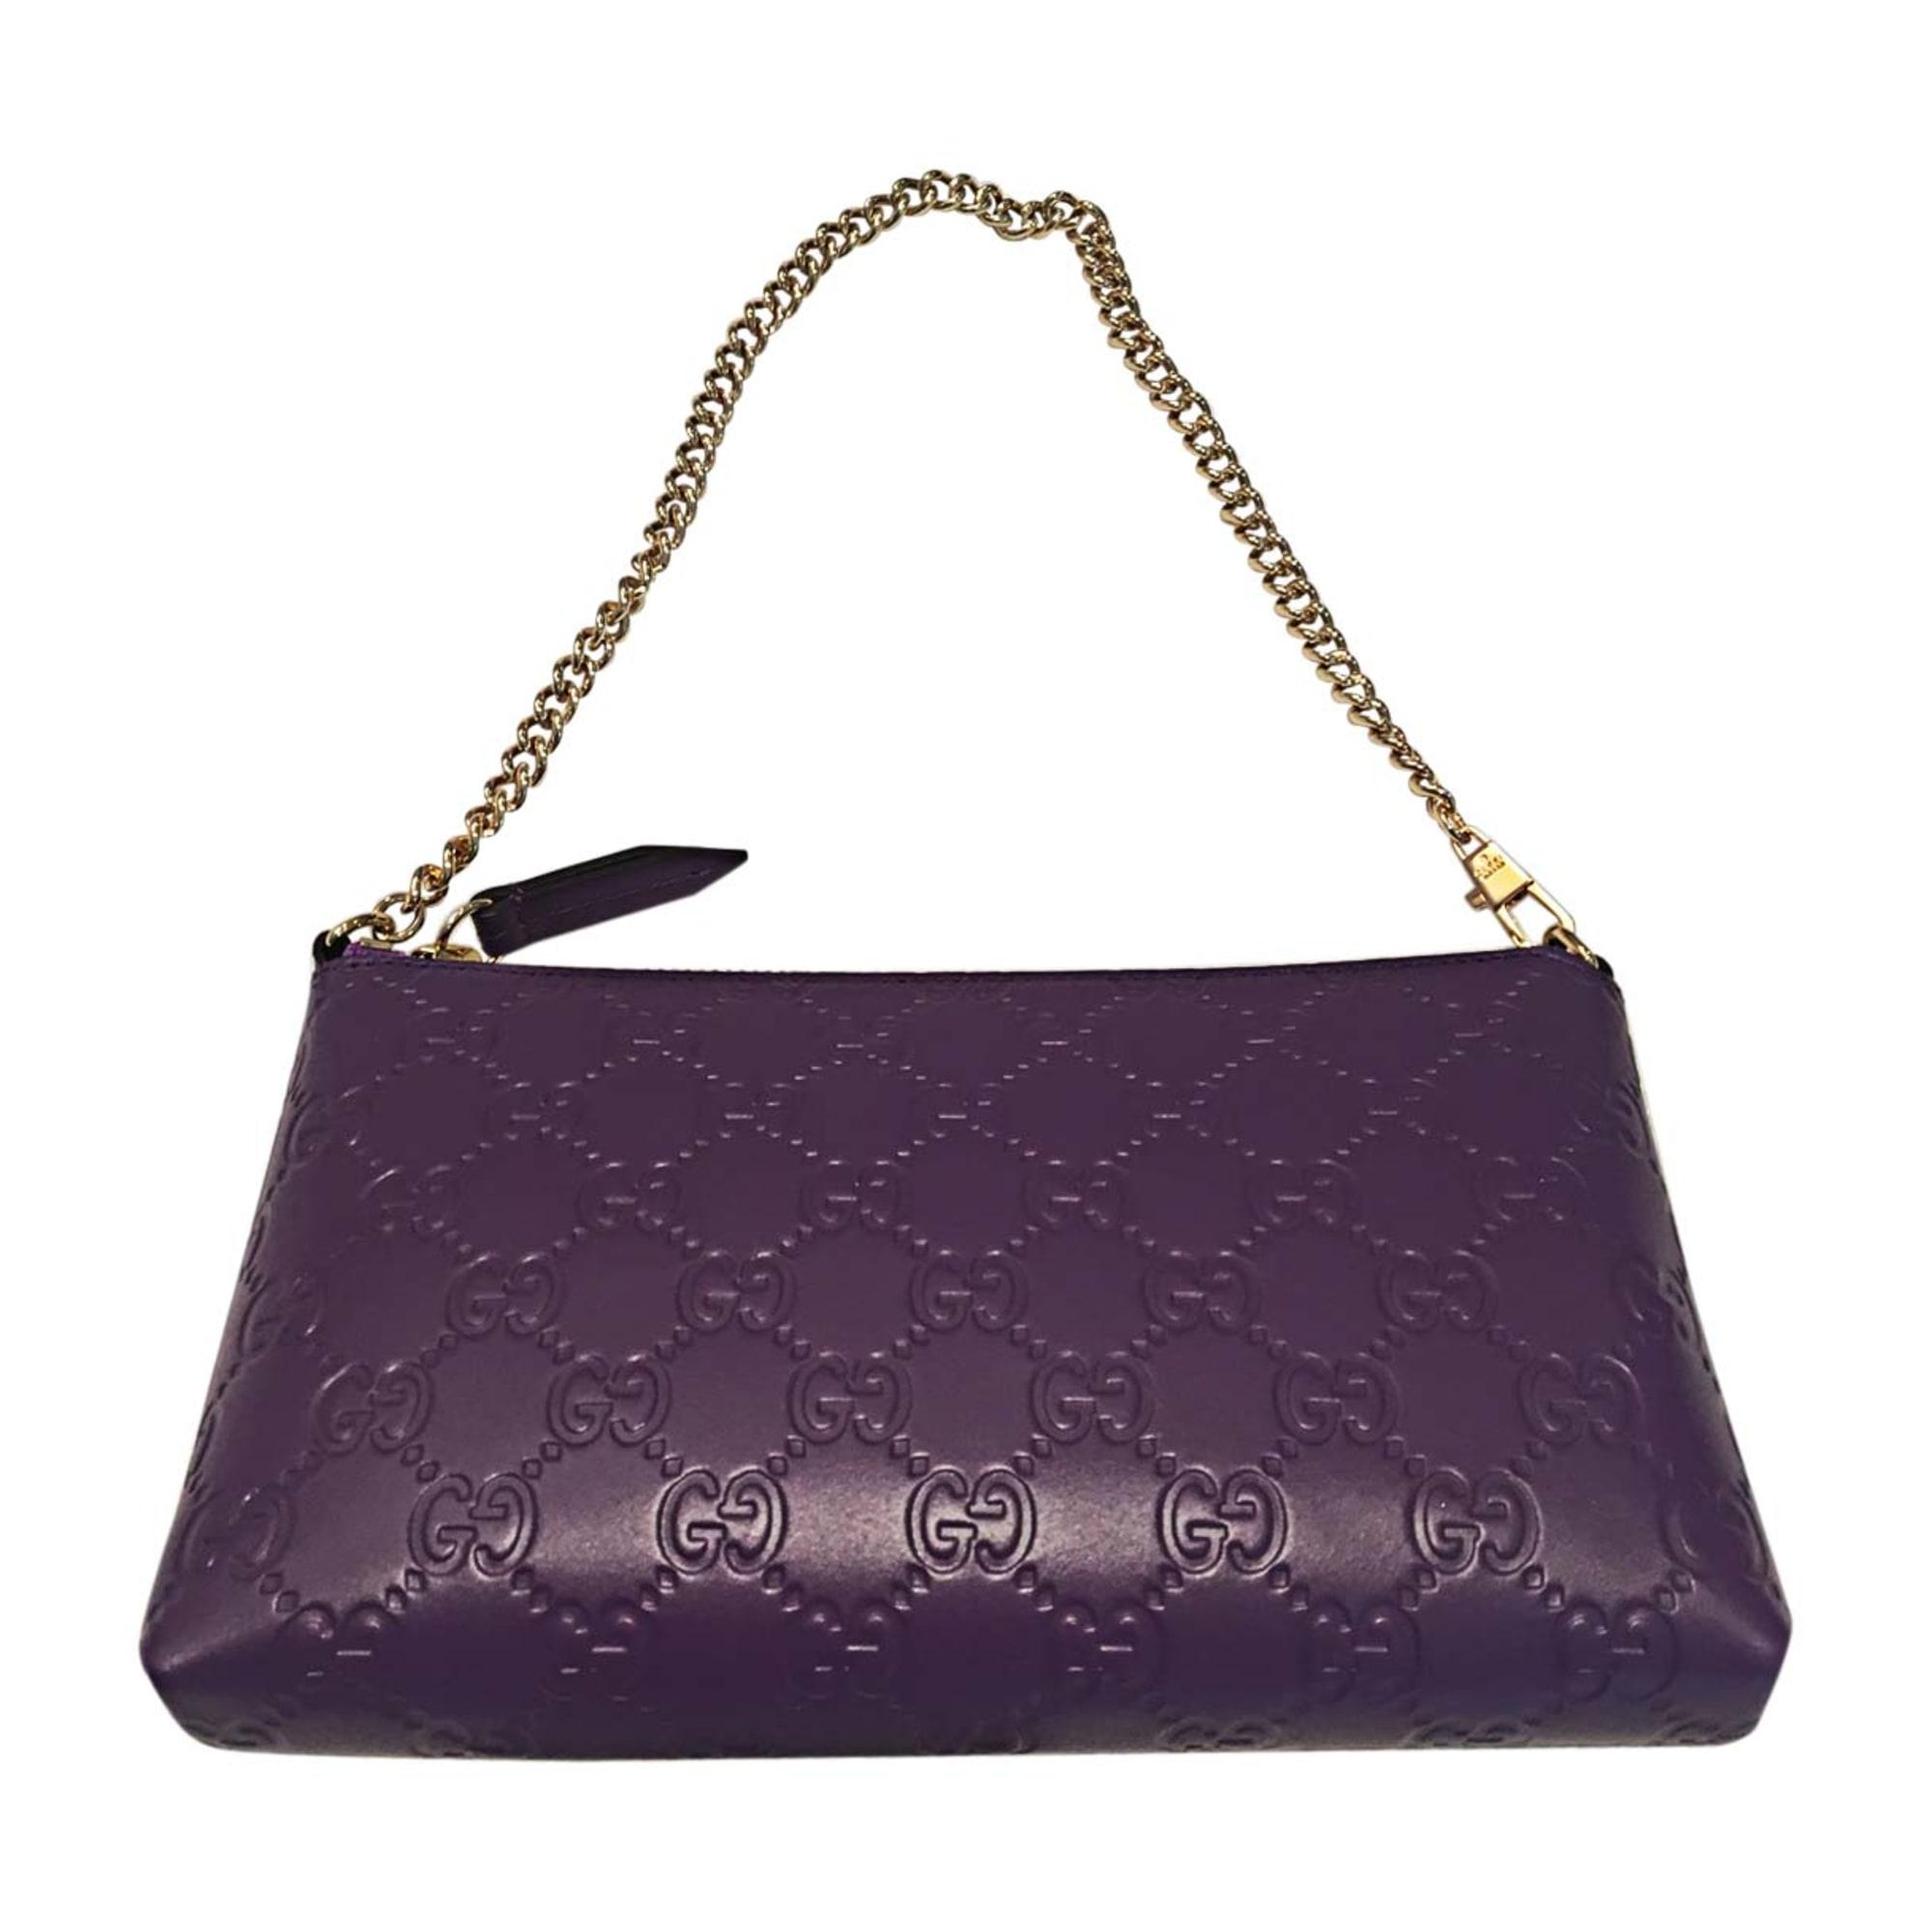 3211f1718f0b Sac pochette en cuir GUCCI violet vendu par Kim - fwi - 7058217